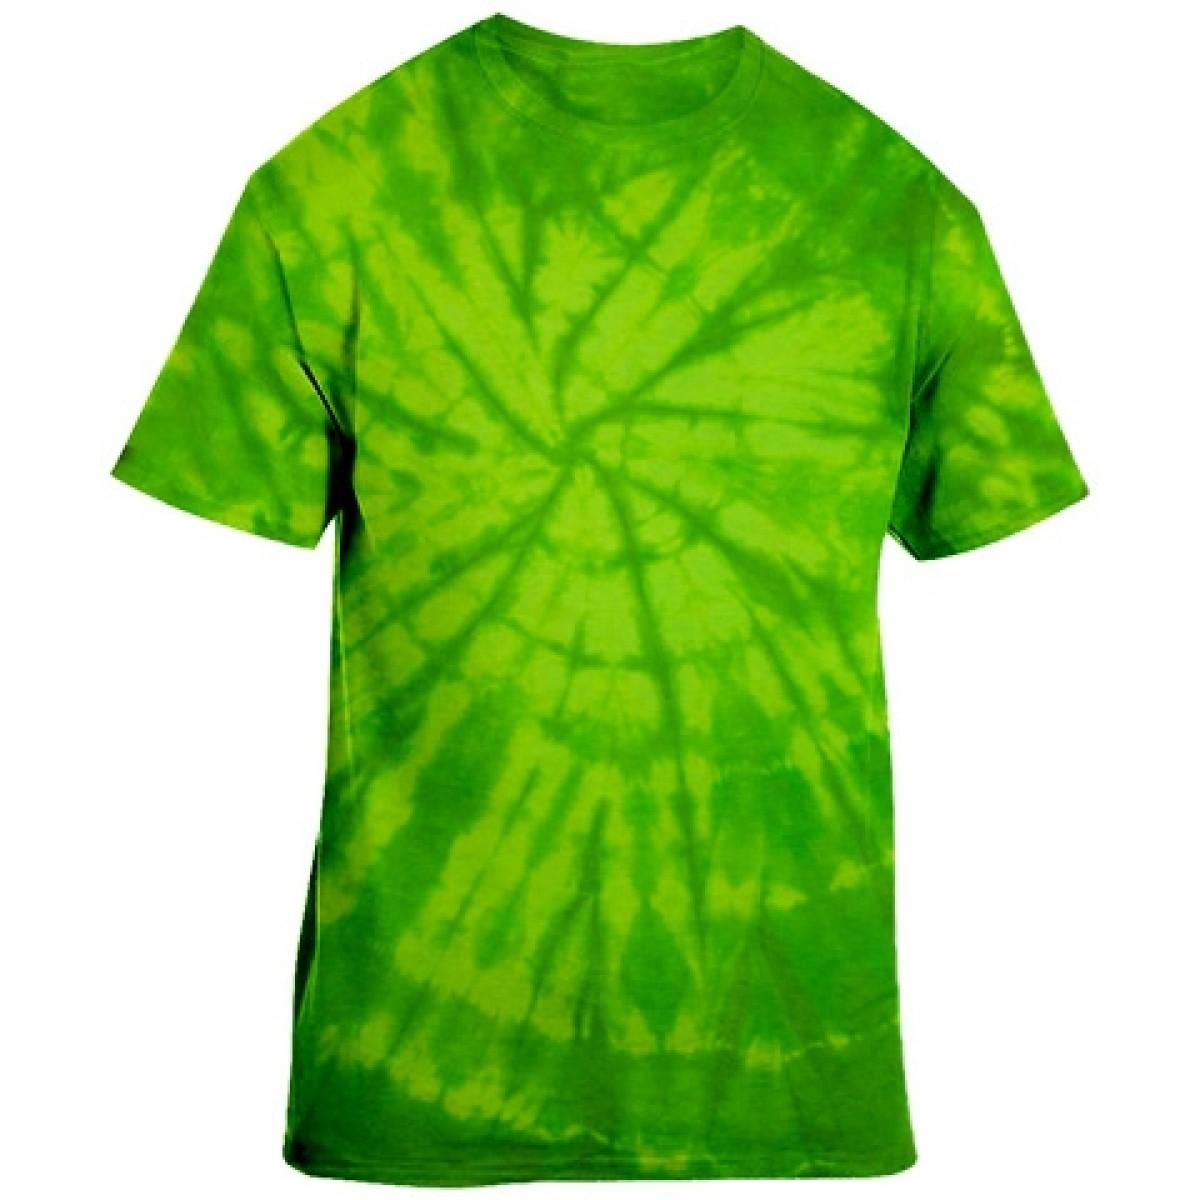 Tie-Dye Neon Green Short Sleeve-Neon Green-M